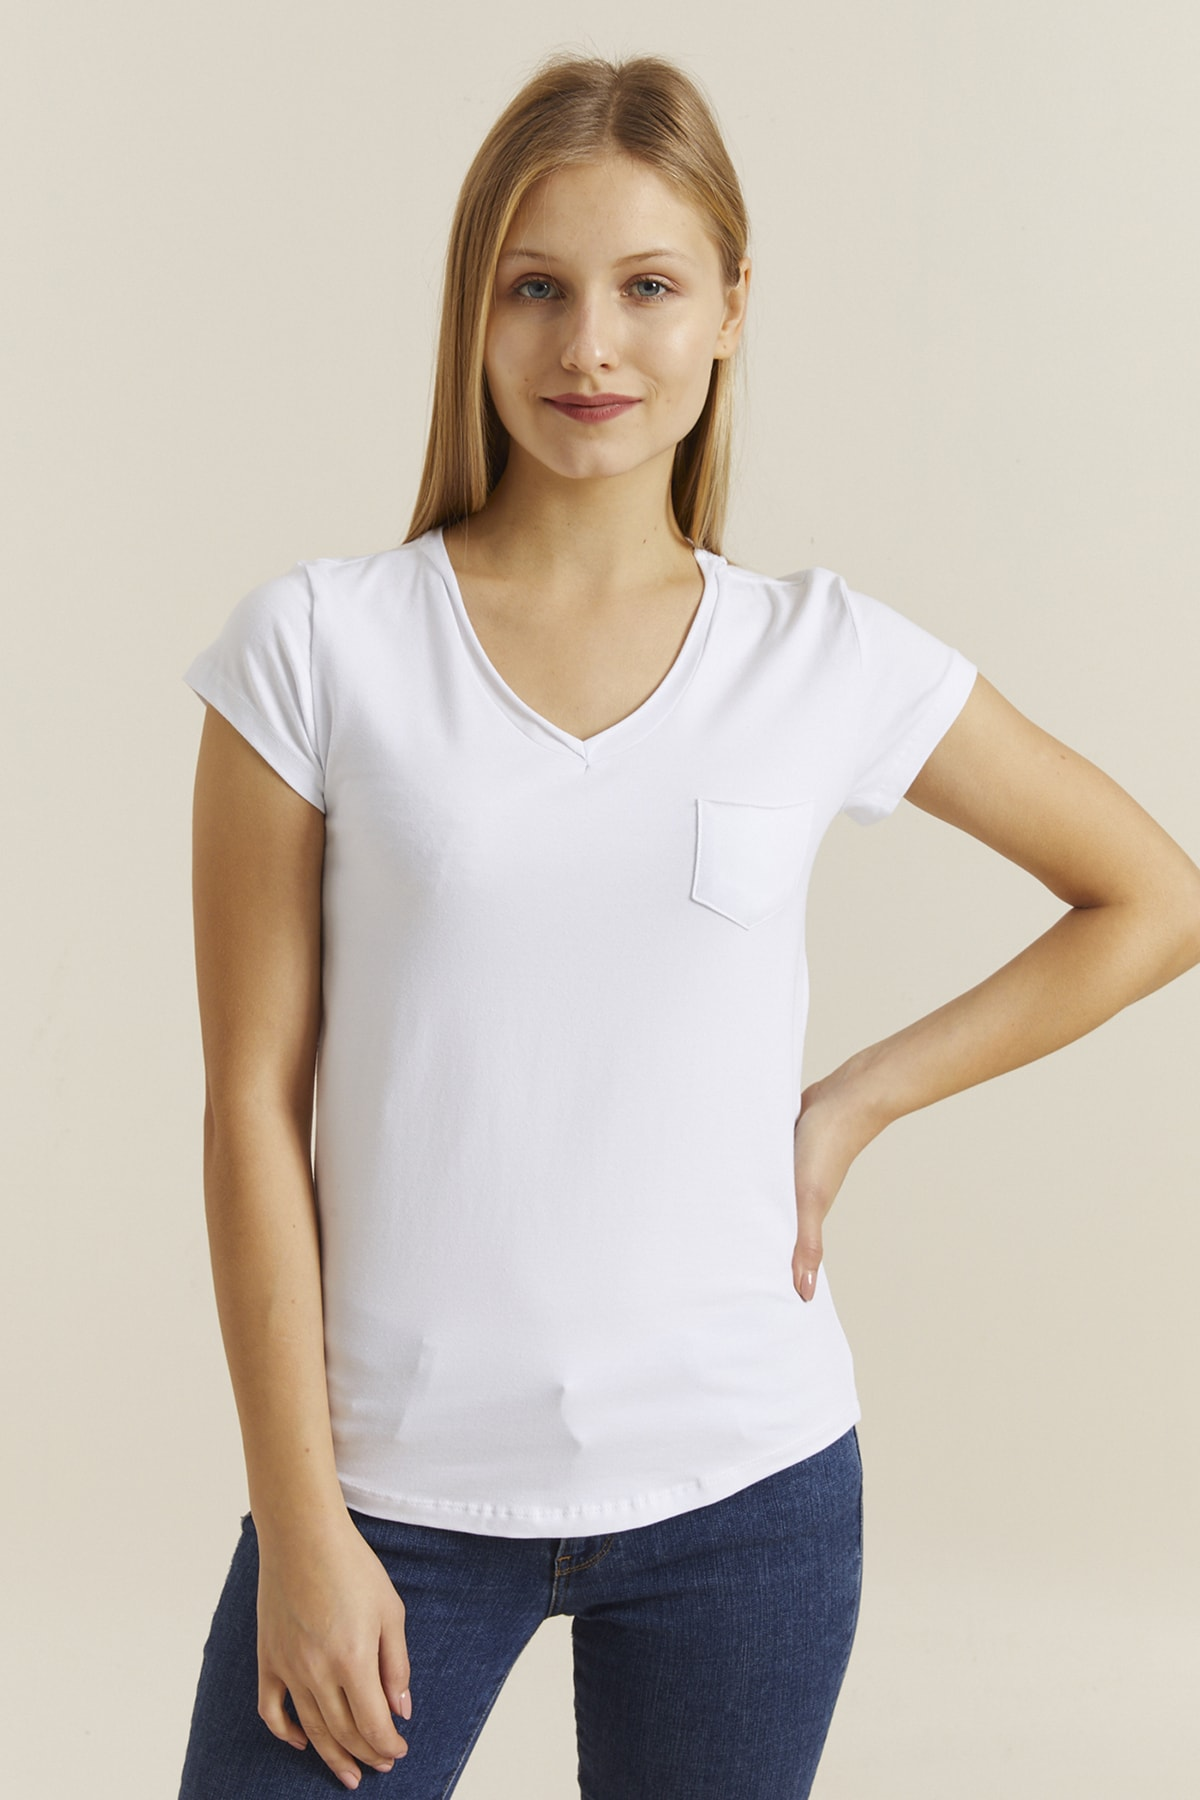 DYNAMO Kadın Beyaz V Yaka Cepli T-shirt 19052 1